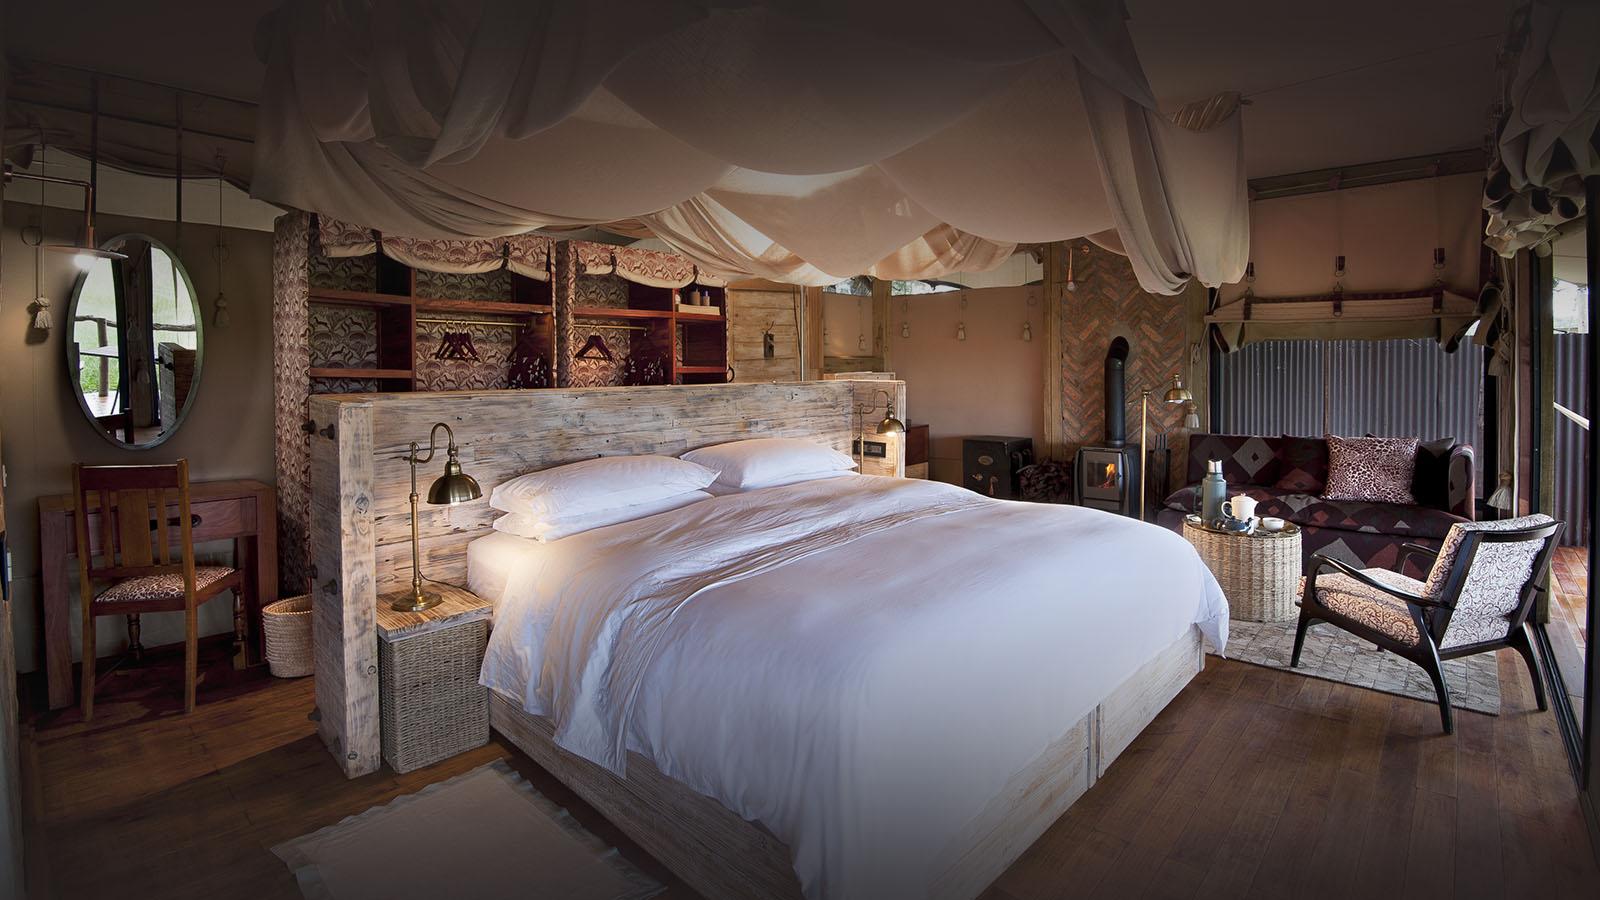 somalisa camp zimbabwe-lodges-zambia-in-style-safaris-wildlife-africa-hwange-national-park-rooms